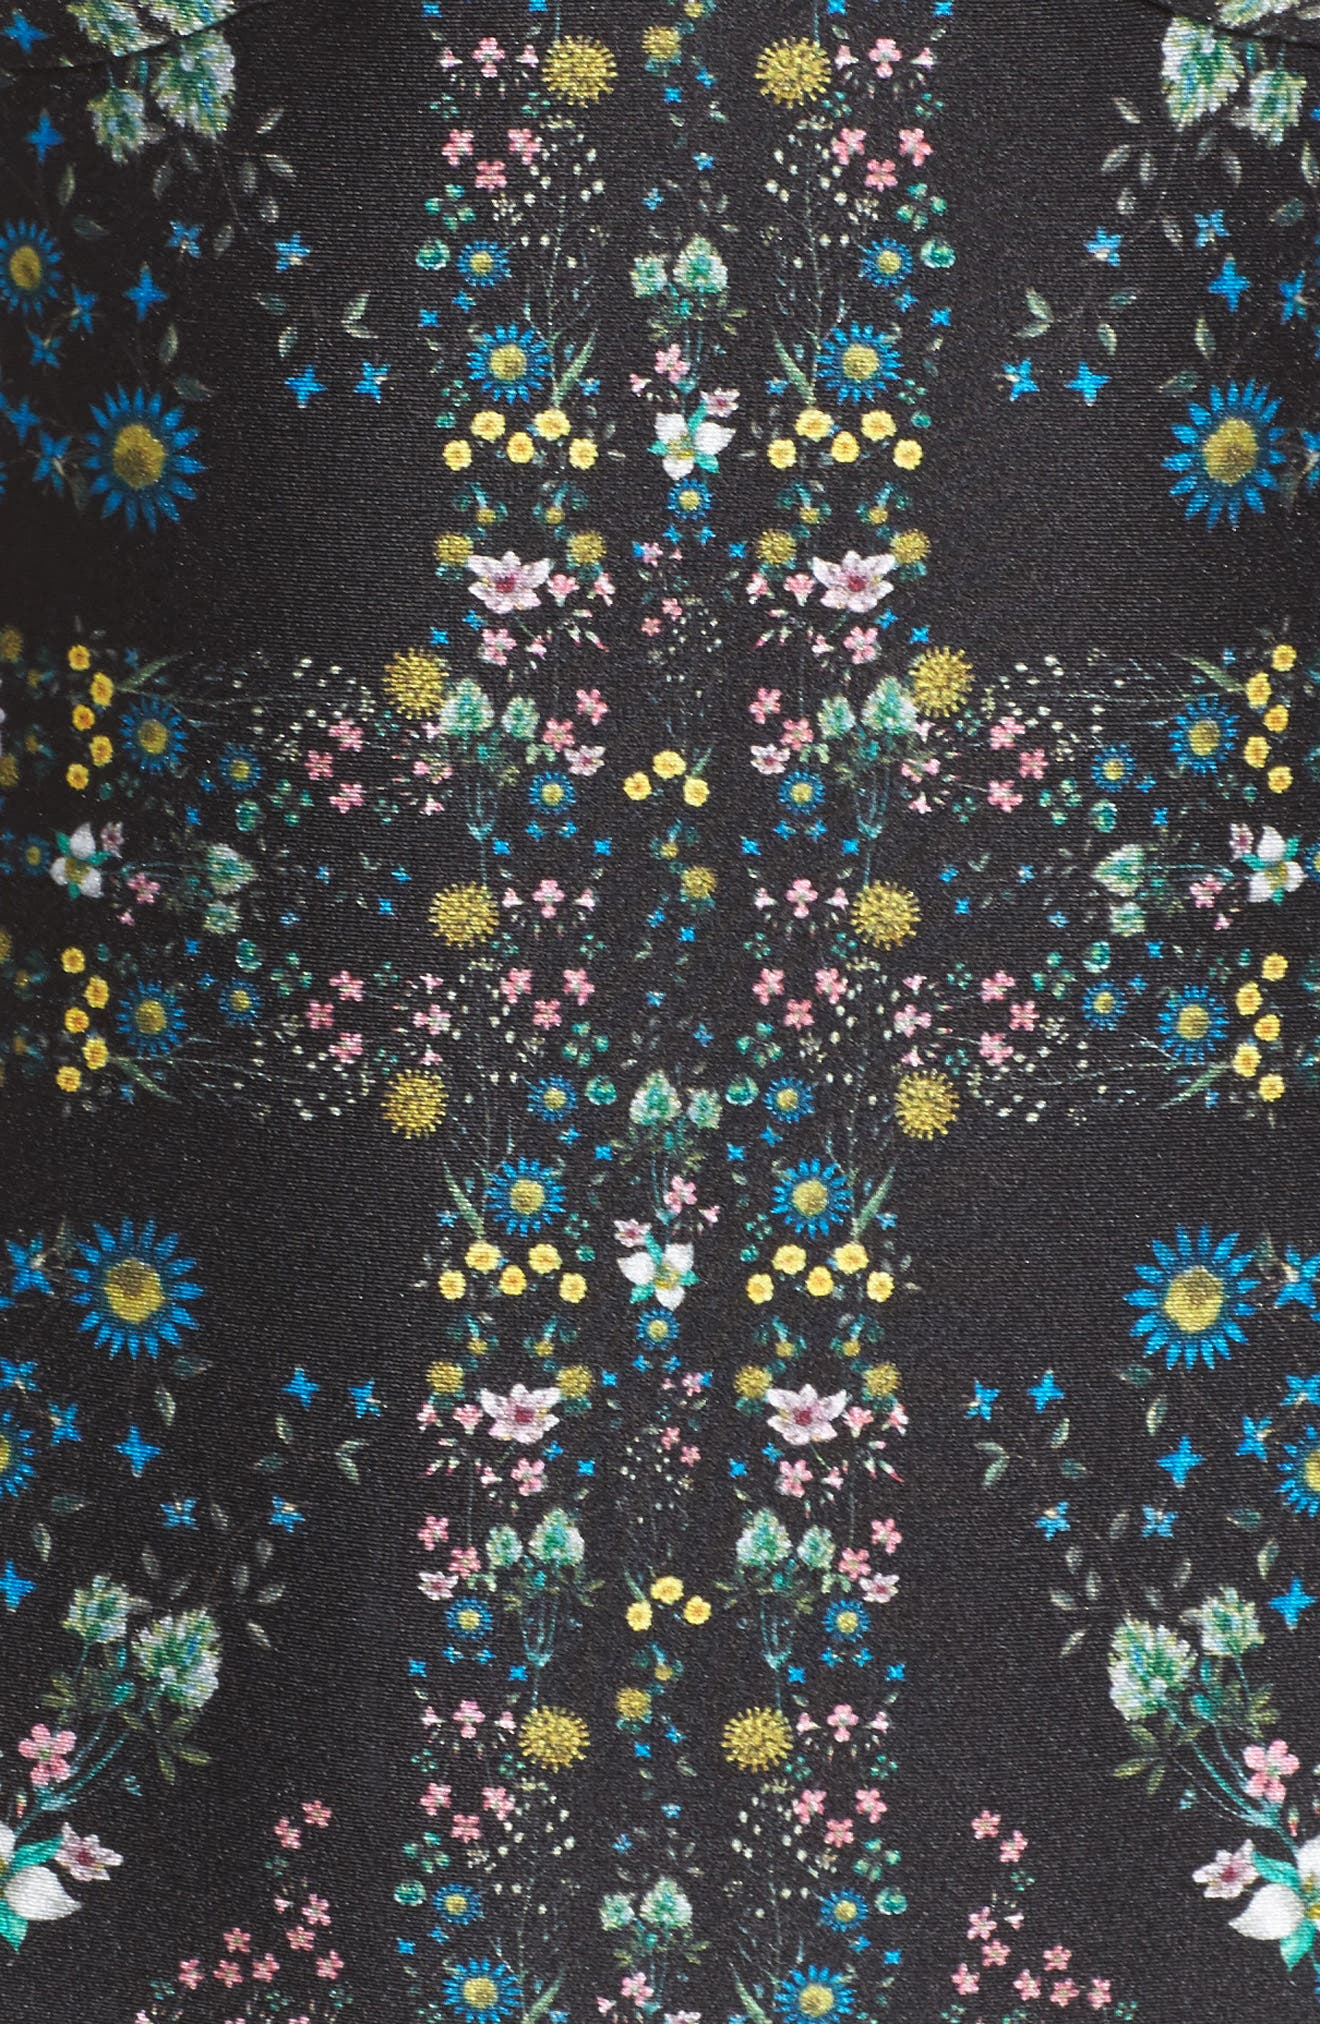 Unity Floral Halter One-Piece Swimsuit,                             Alternate thumbnail 5, color,                             001